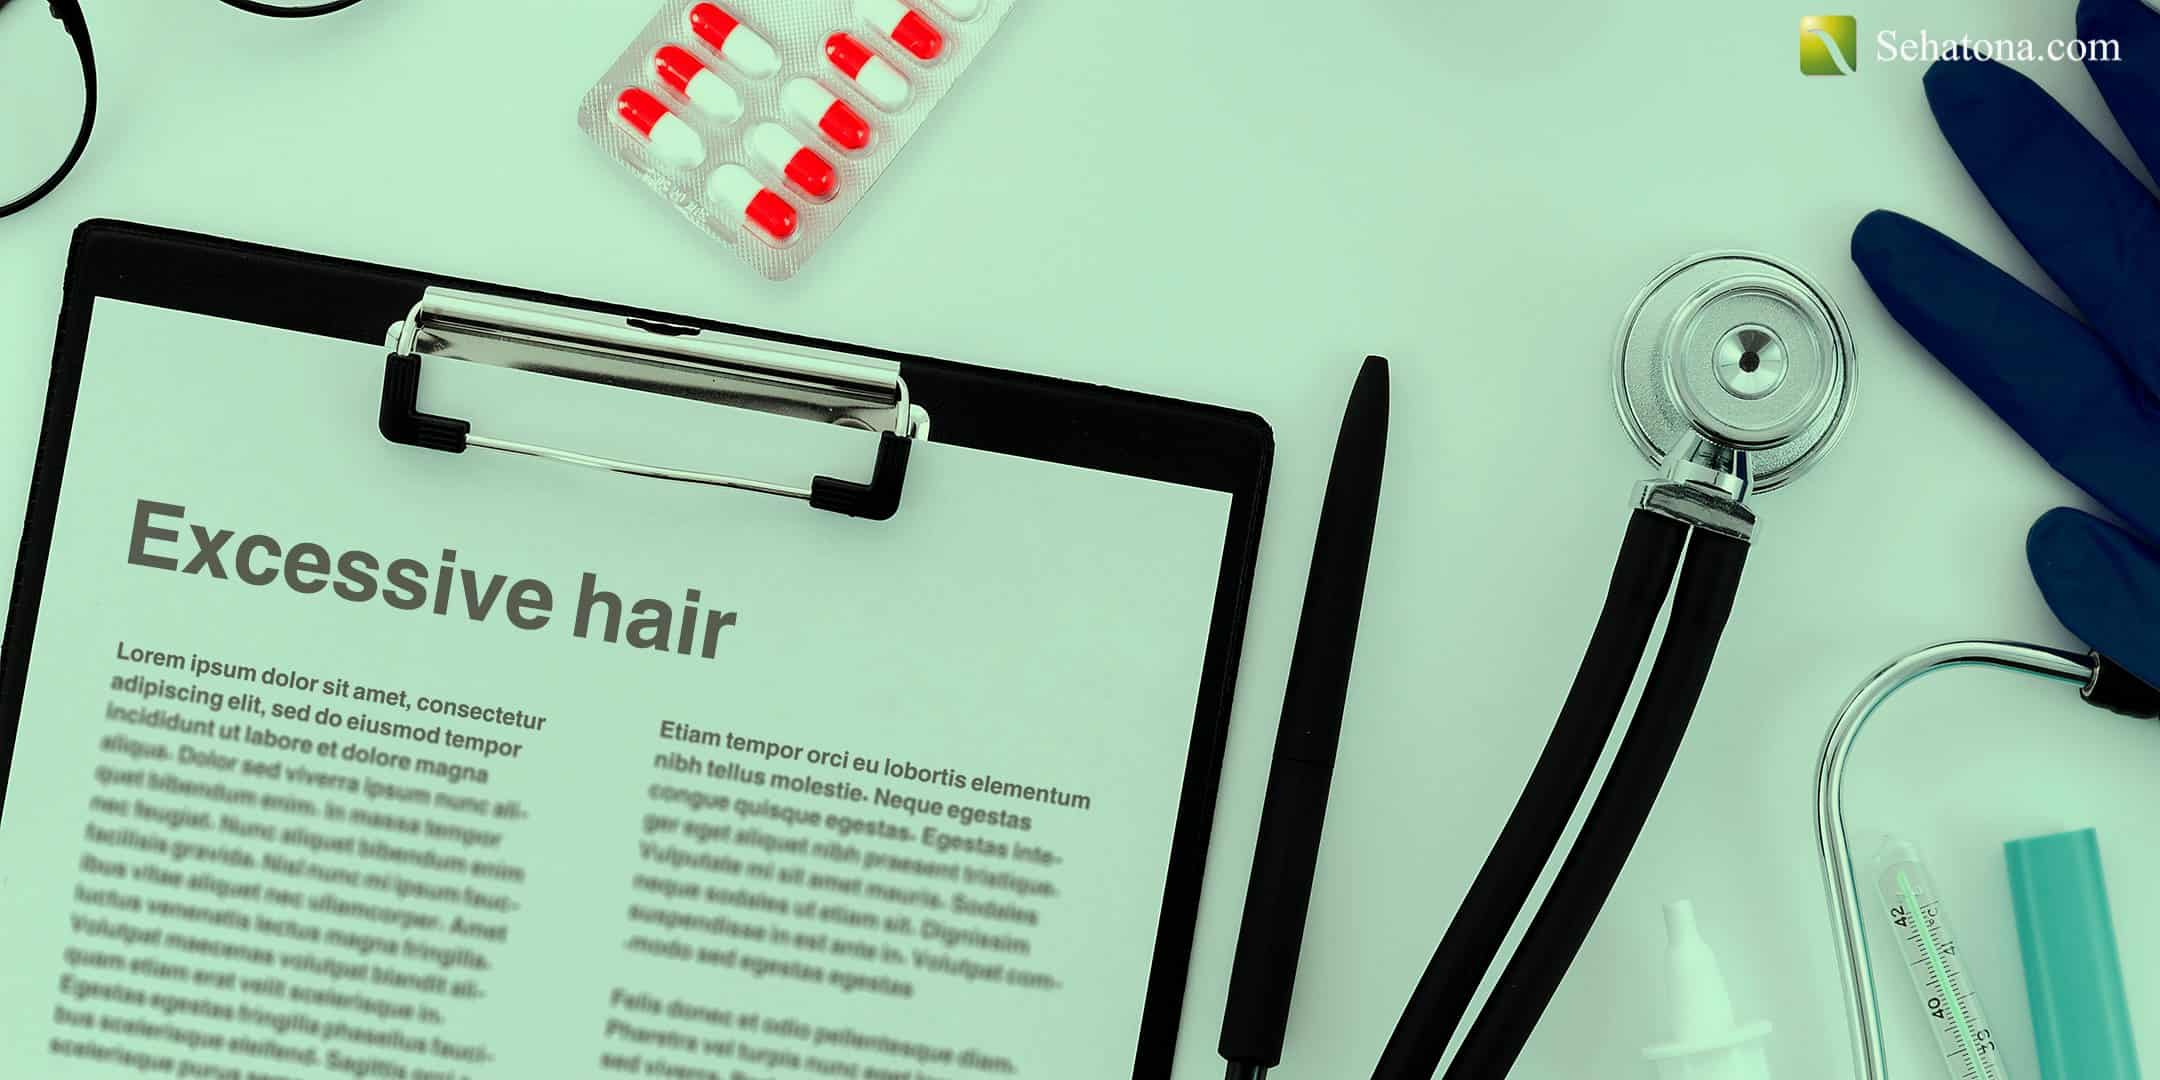 الشعر الزائد Excessive hair